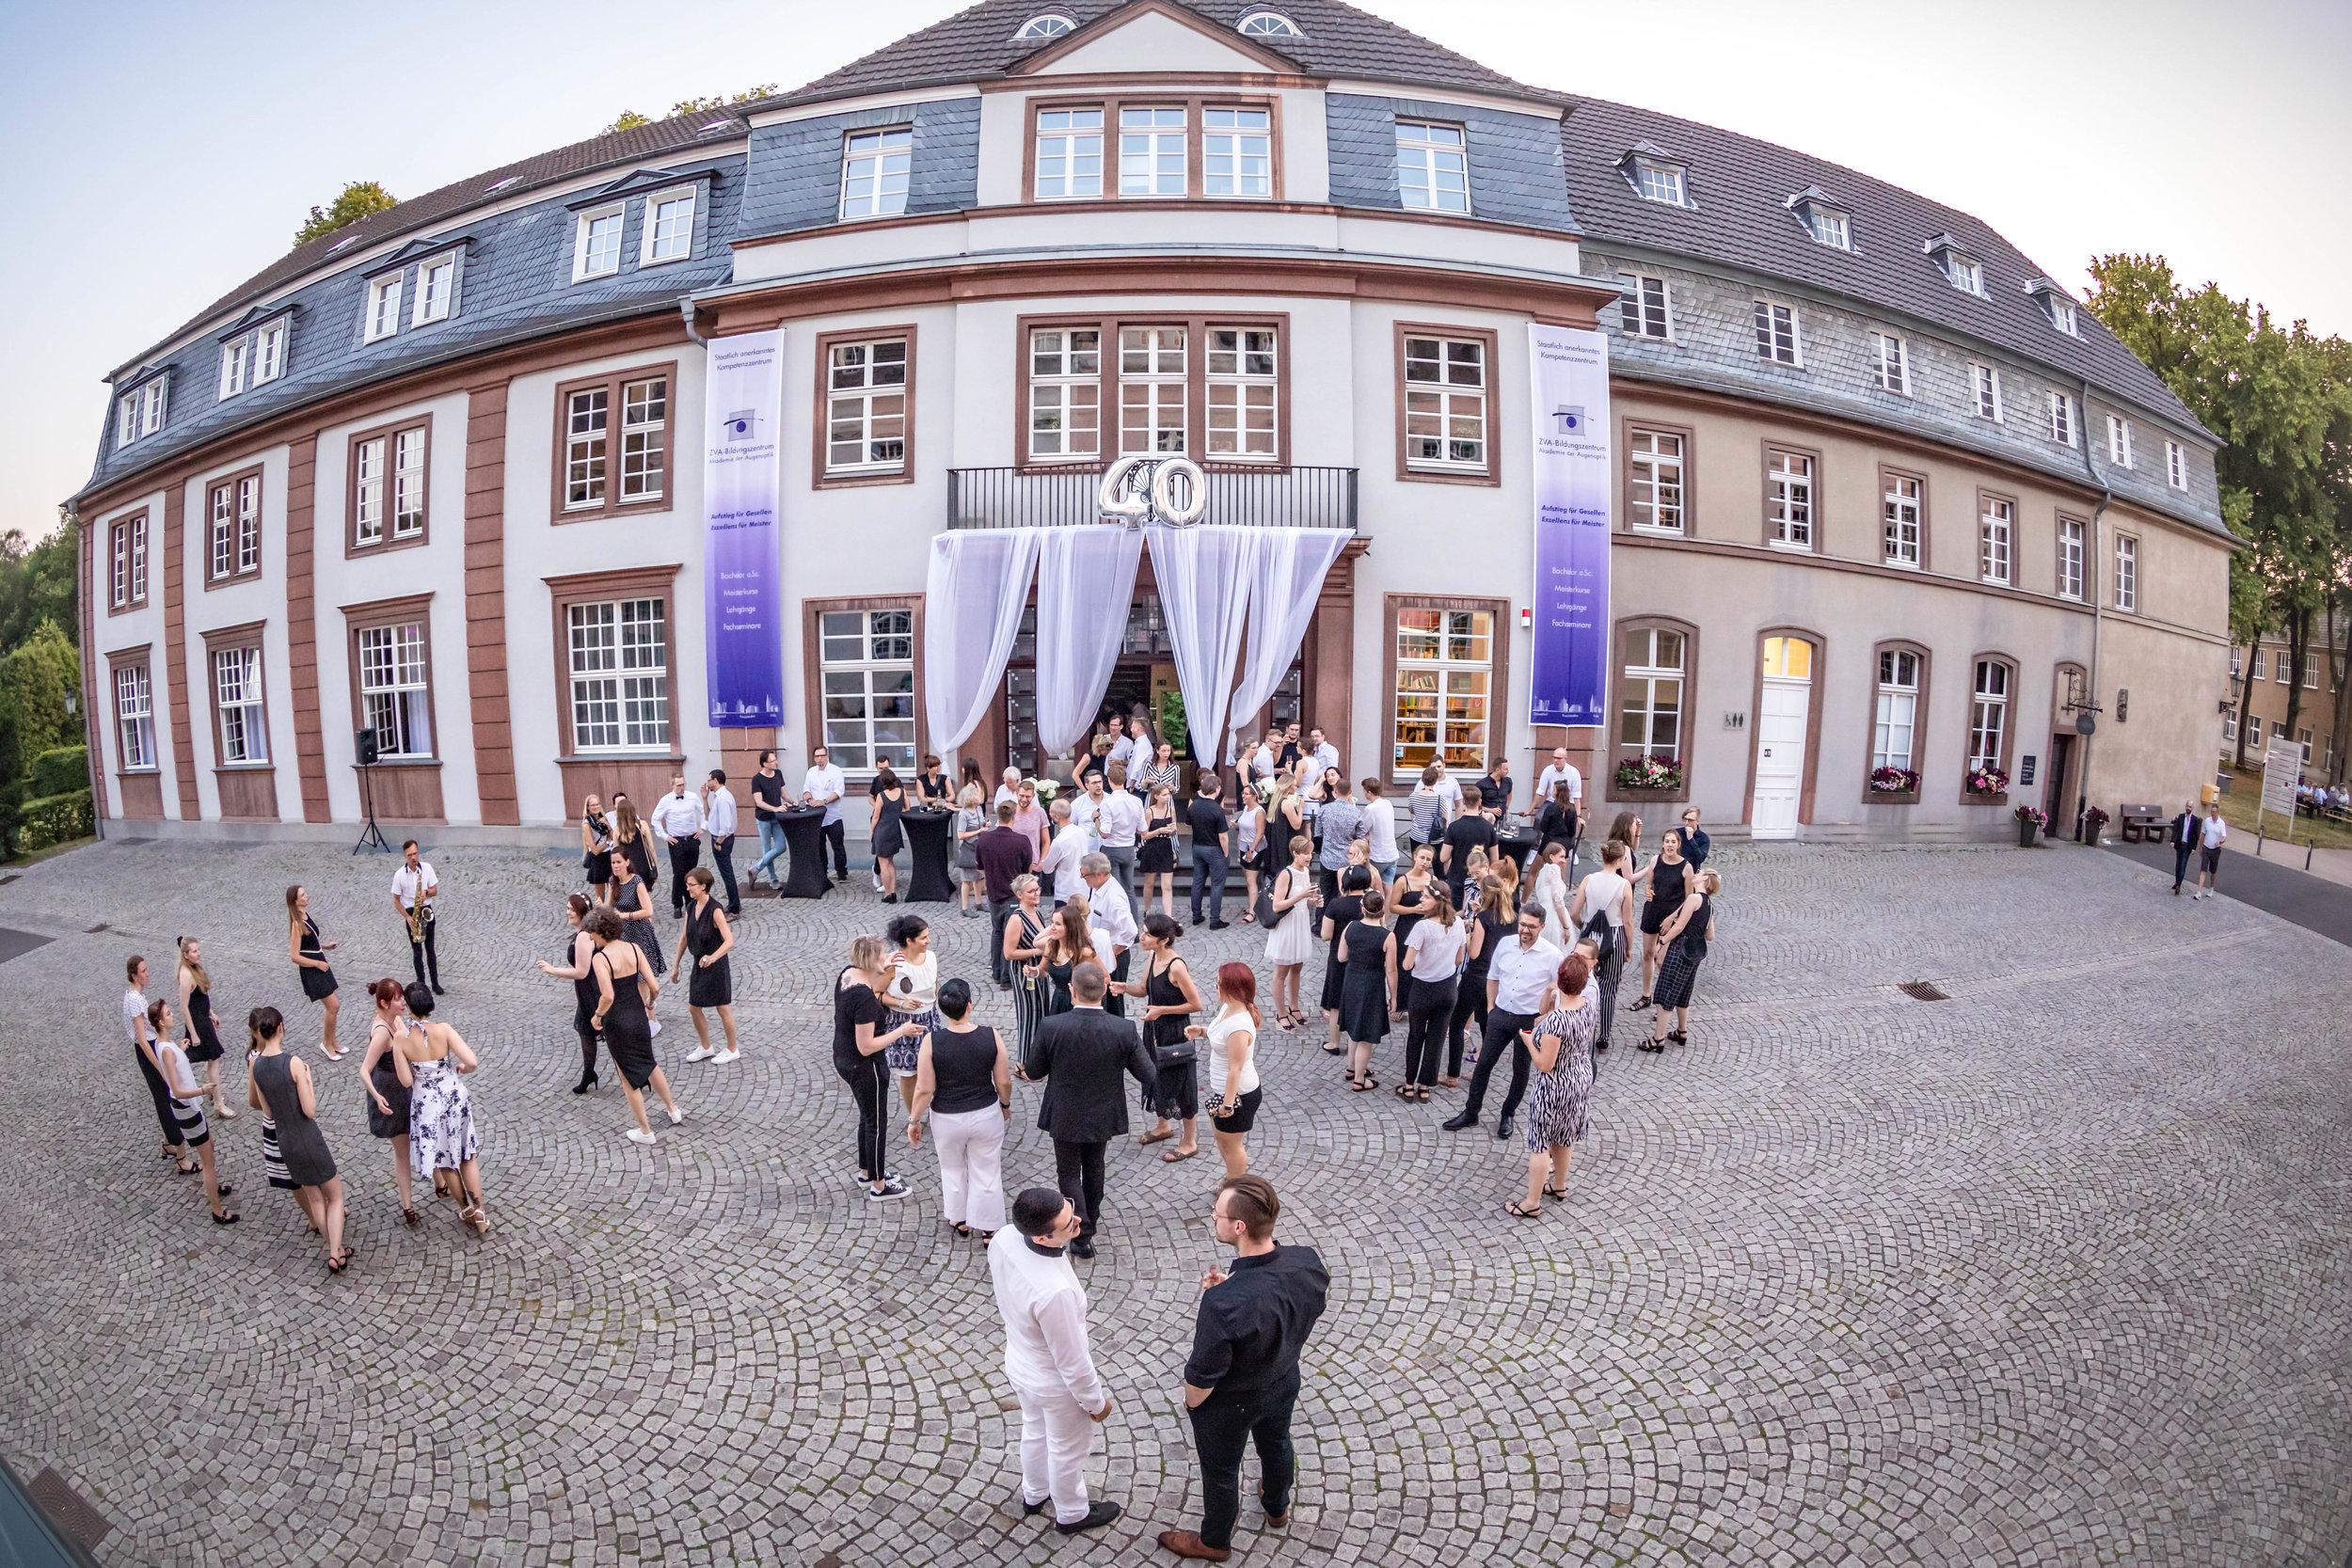 20190626_Akademie_40-jähriges_Jubiläum_kl-5412681.jpg